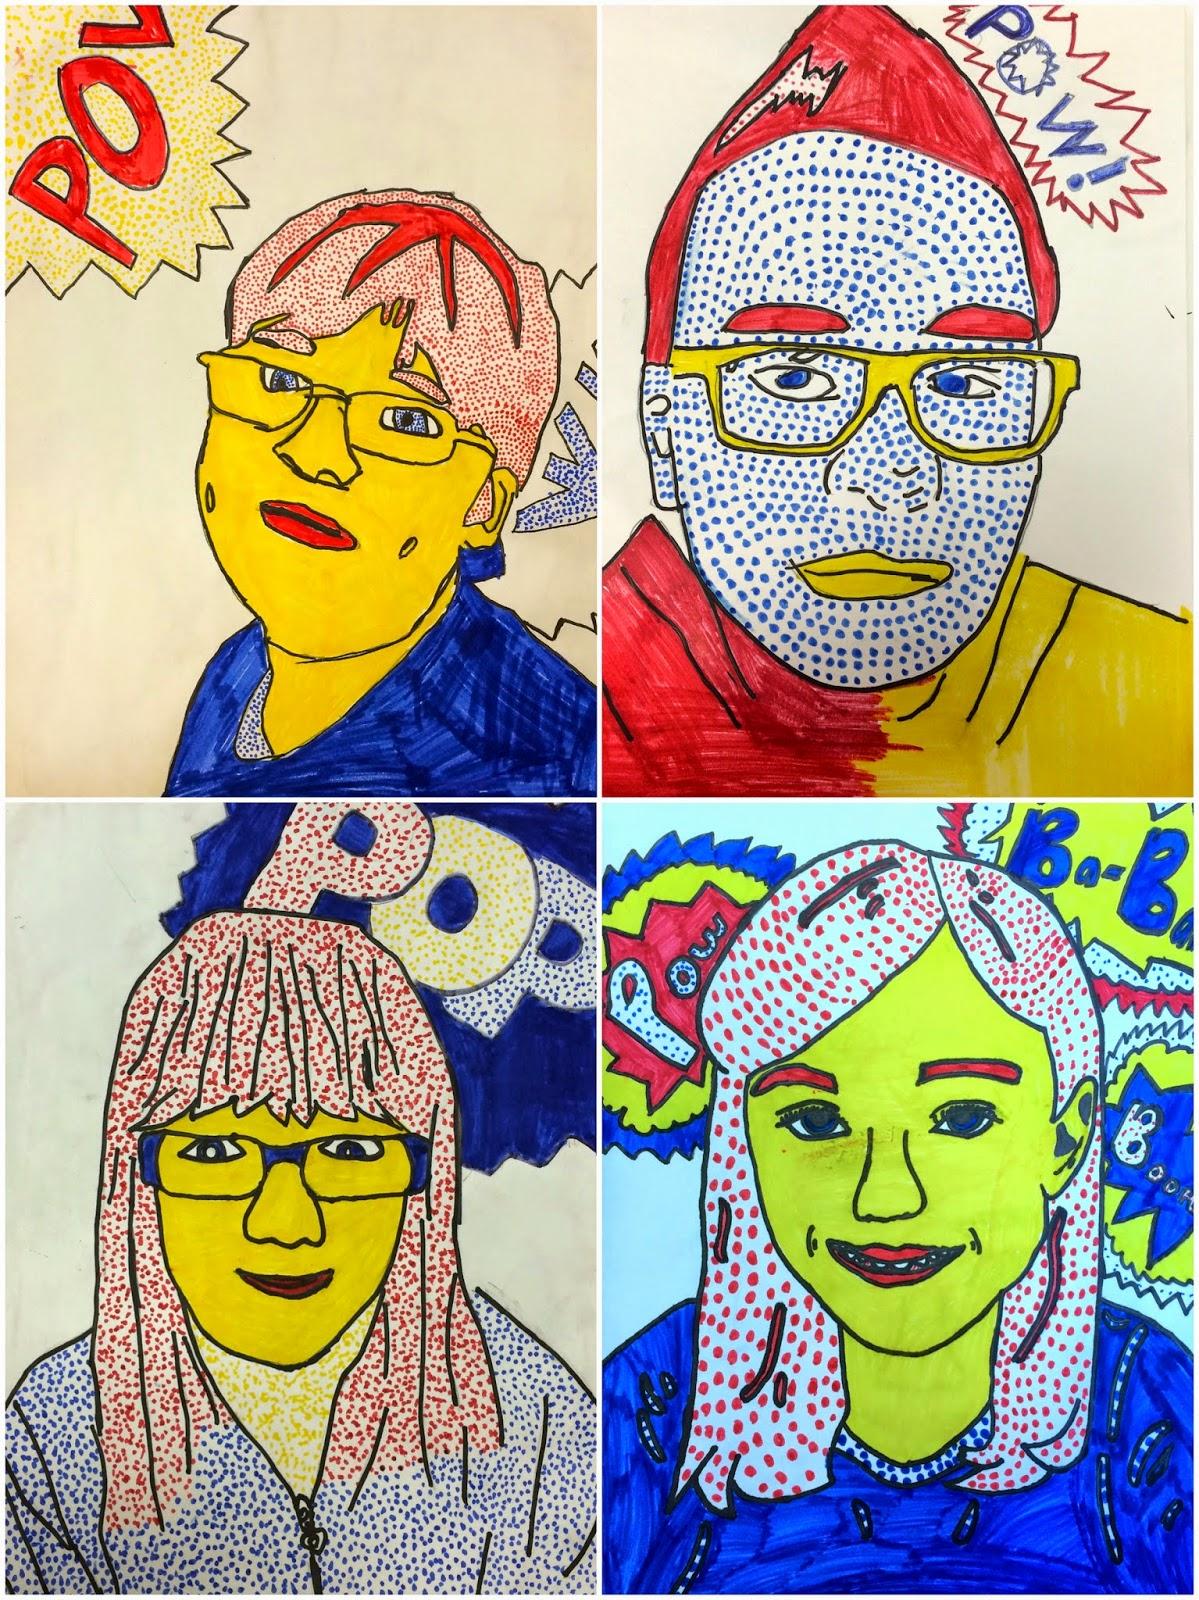 art eat tie dye repeat 6th grade roy lichtenstein self portraits